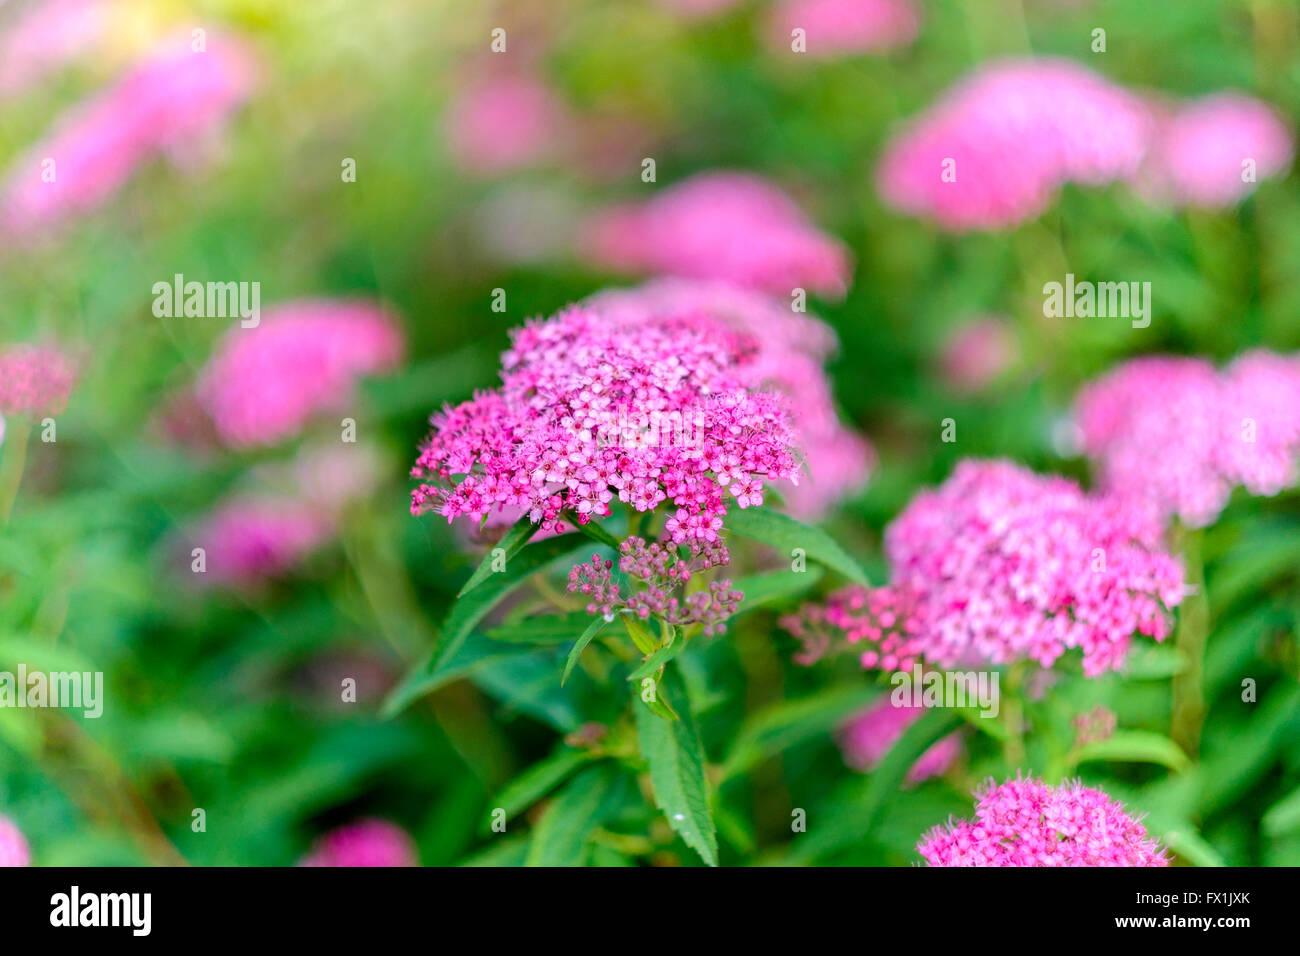 Spiraea japonica shrub with pink blossoms. Oklahoma, USA. - Stock Image